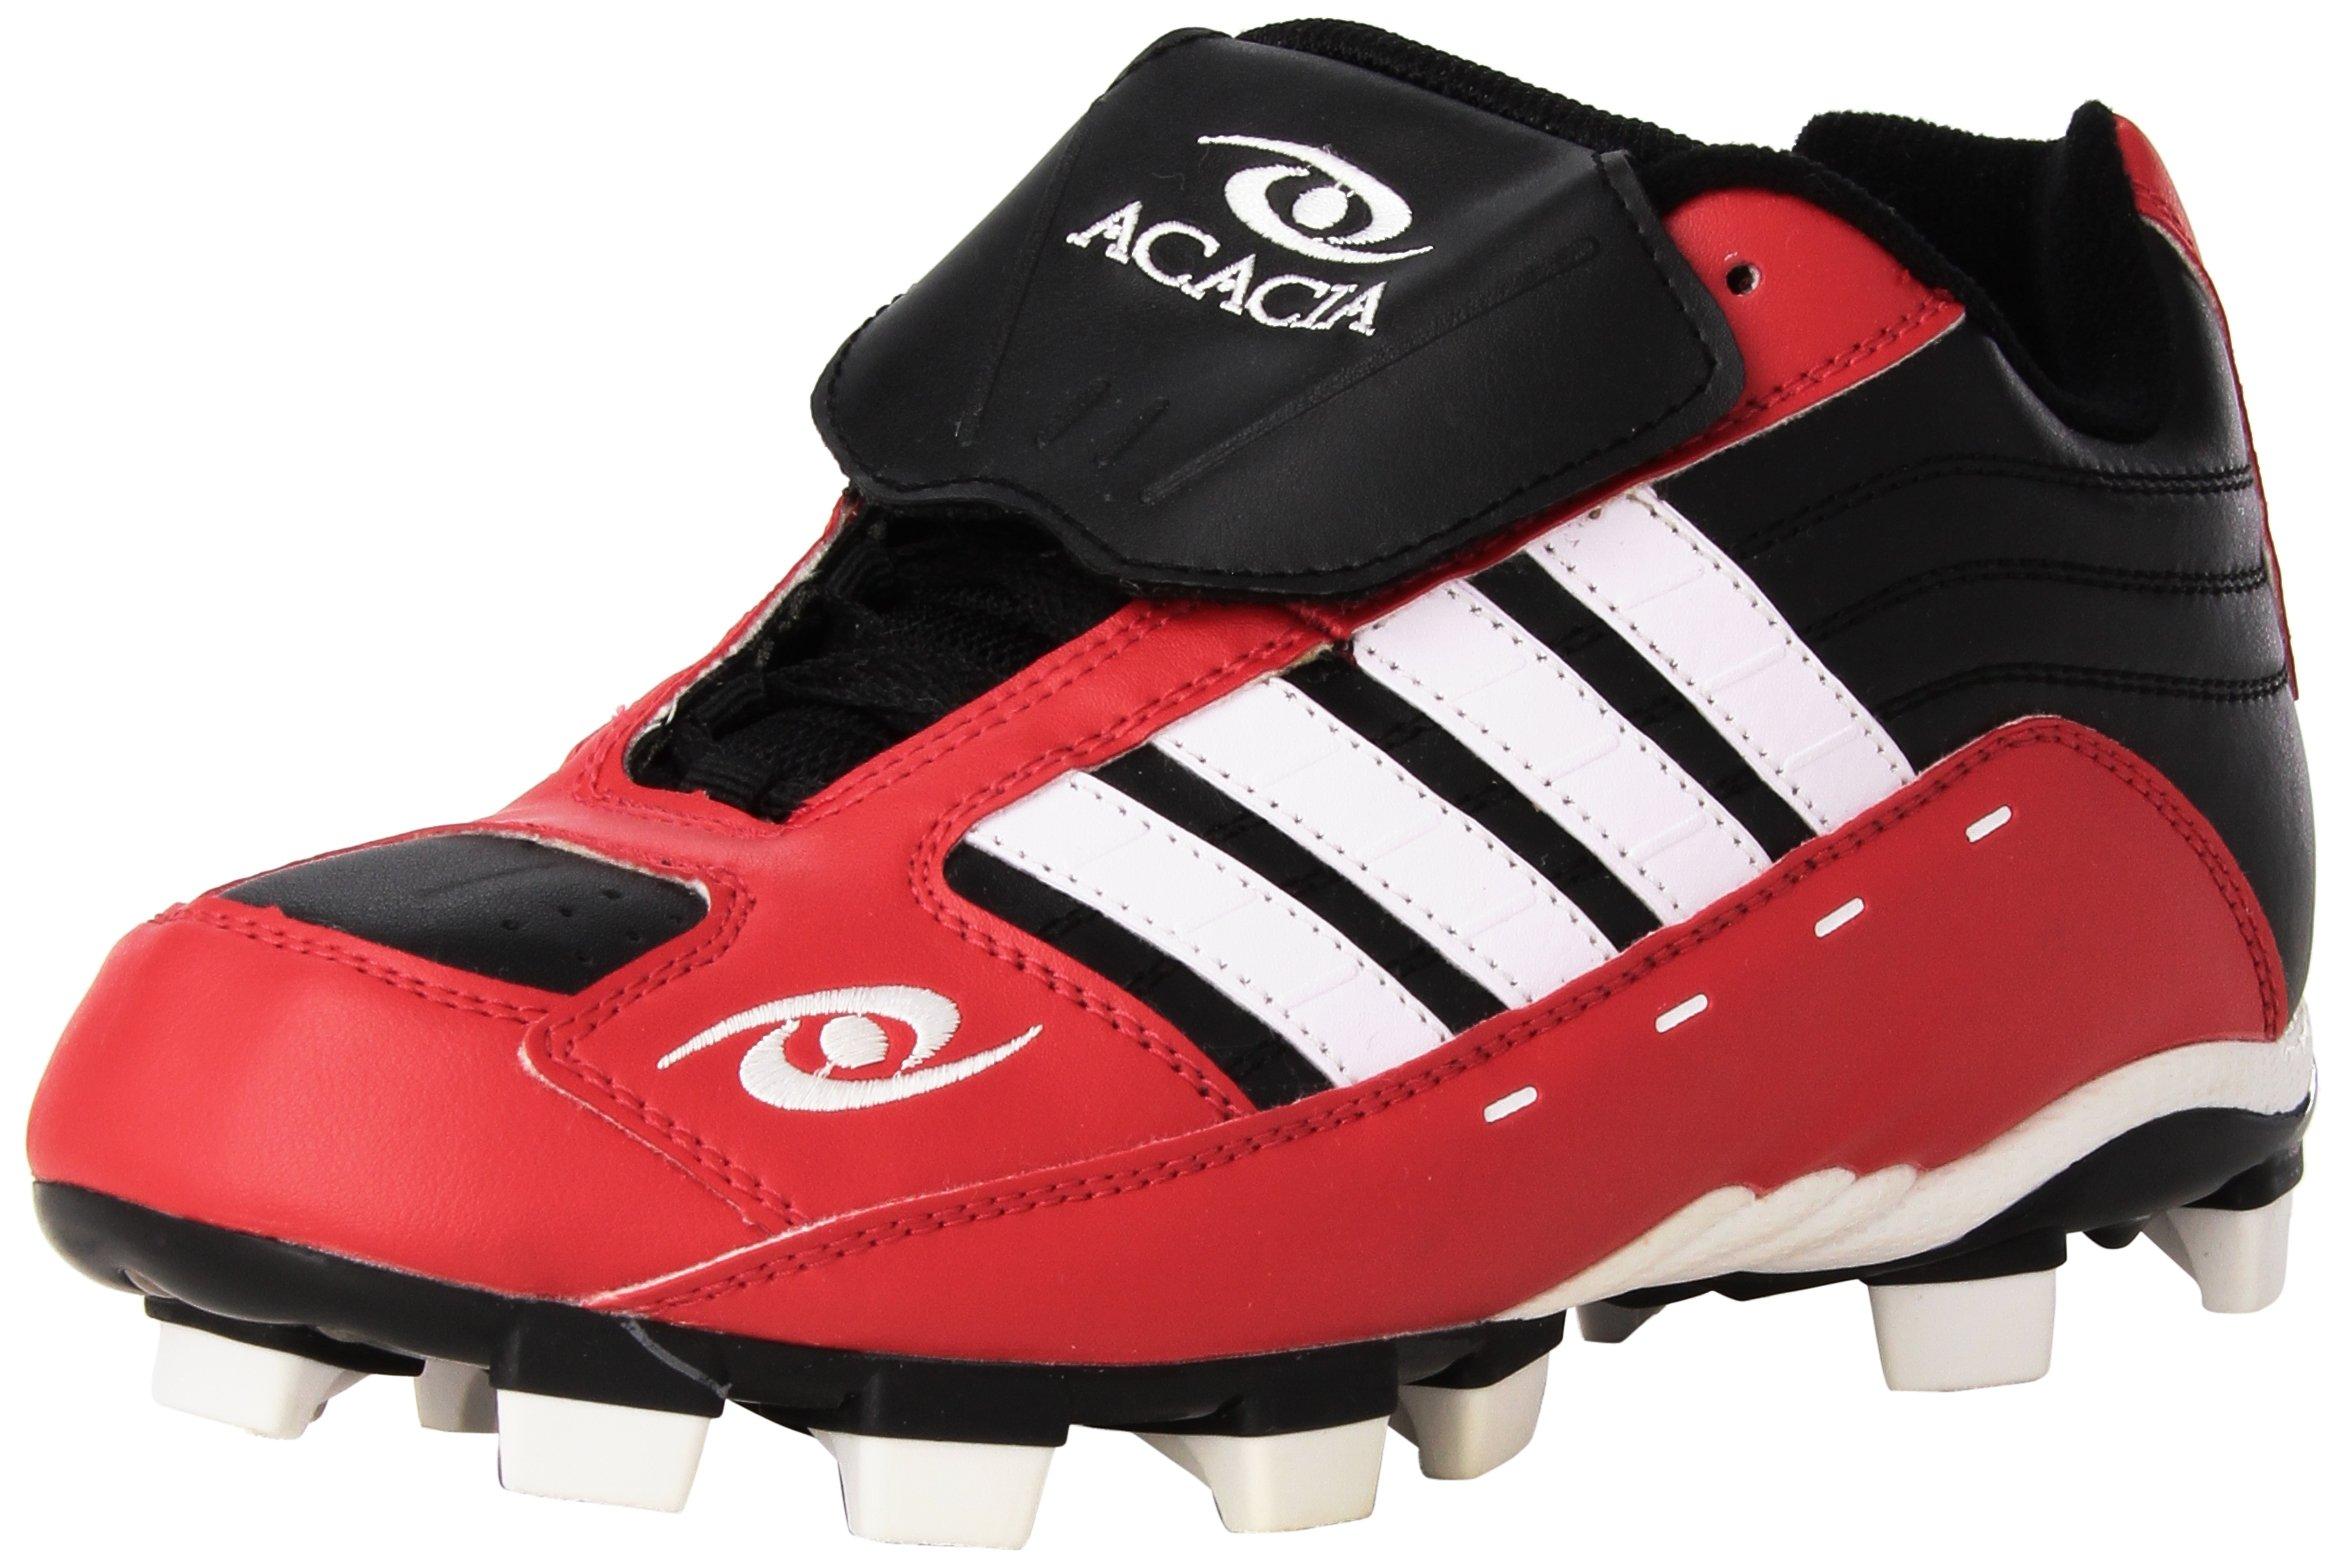 ACACIA Flyer Pro-Low Baseball/Softball Shoes, Black/Red/White, 11